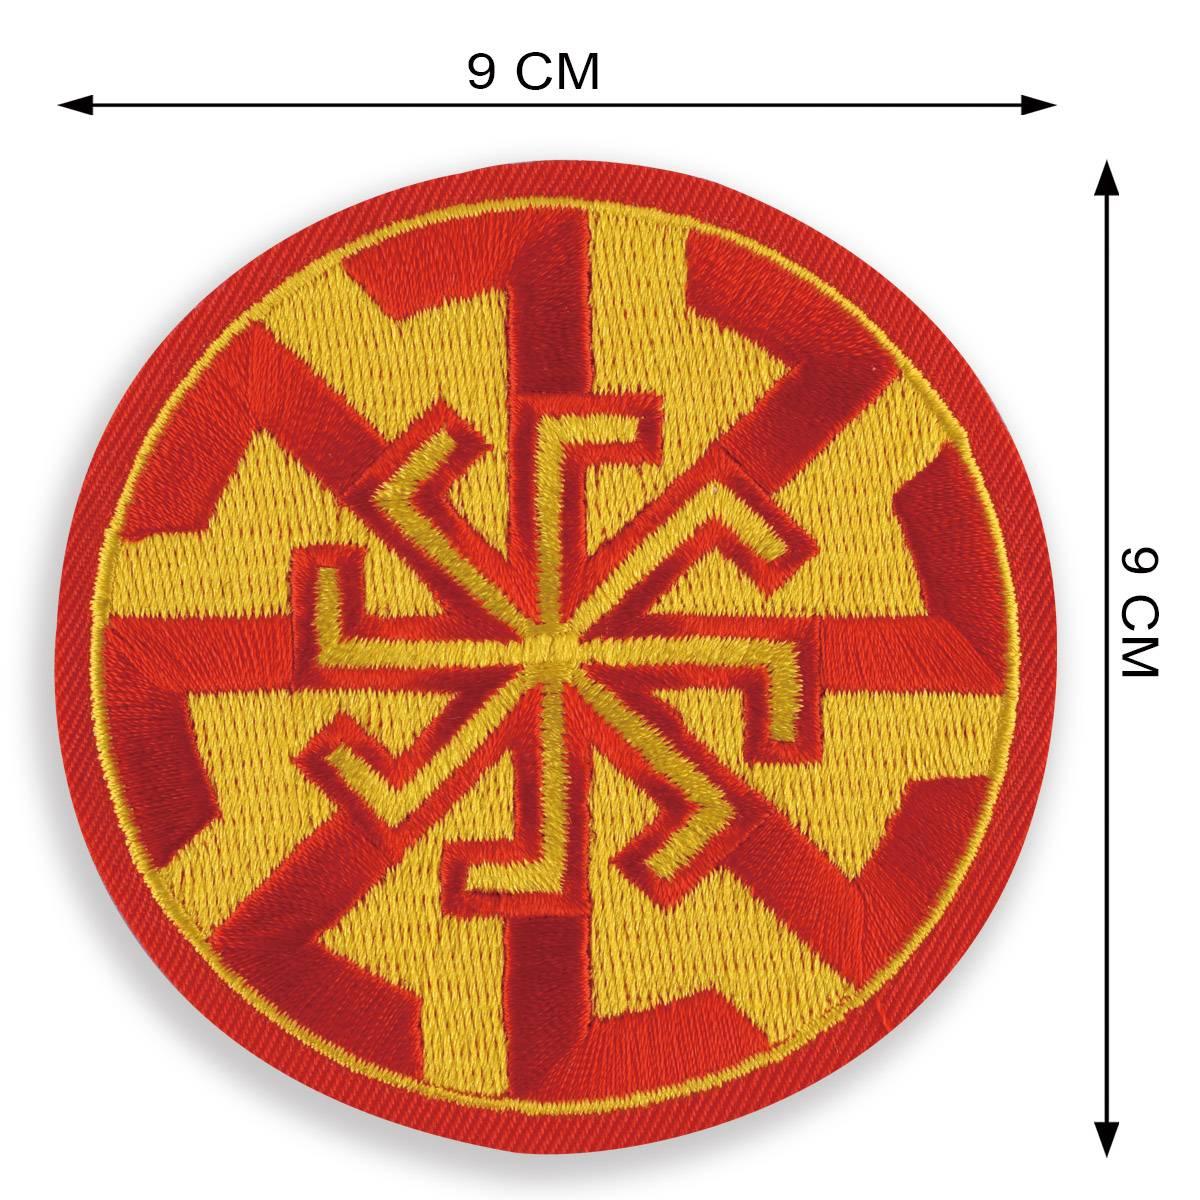 Cлавянская символика - коловрат